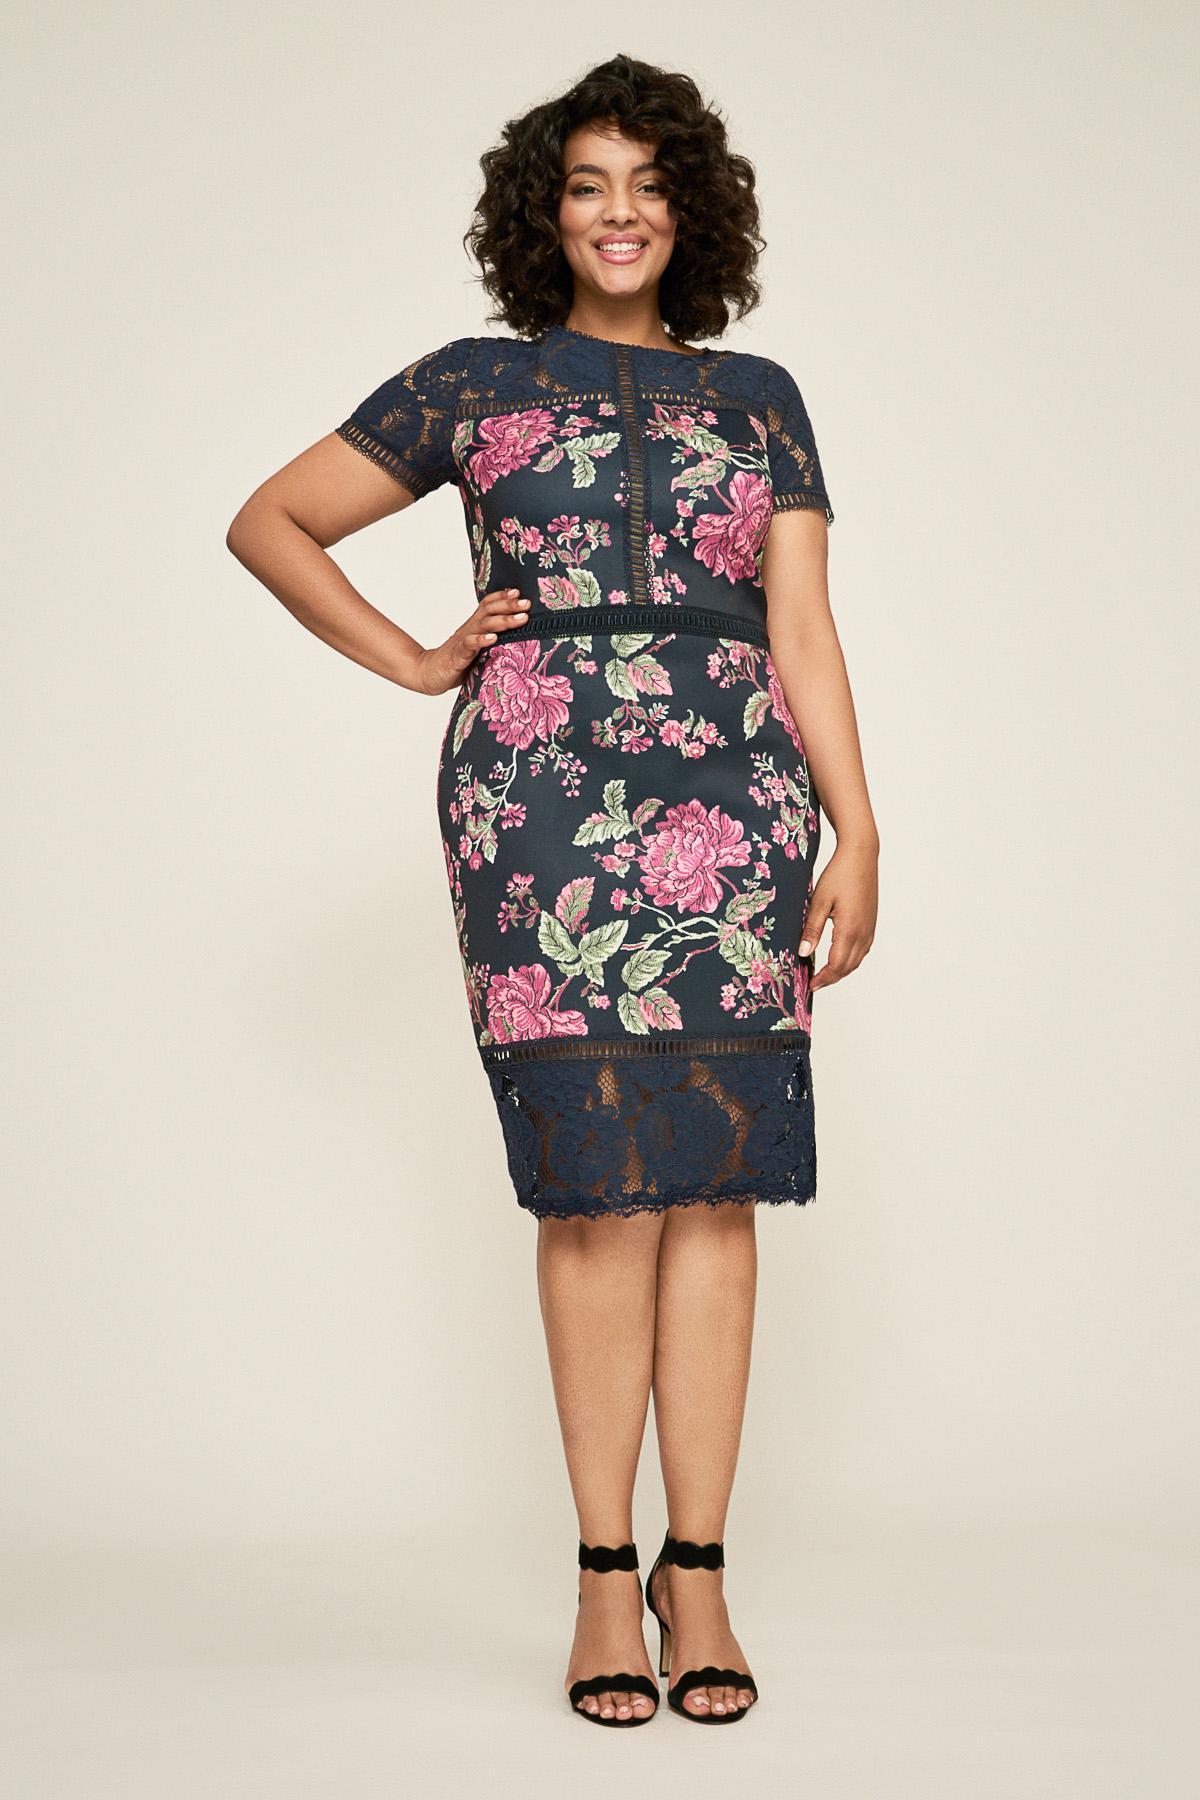 f5d27ba87980d Tadashi Shoji Helena Floral Neoprene Dress - Plus Size - Lyst